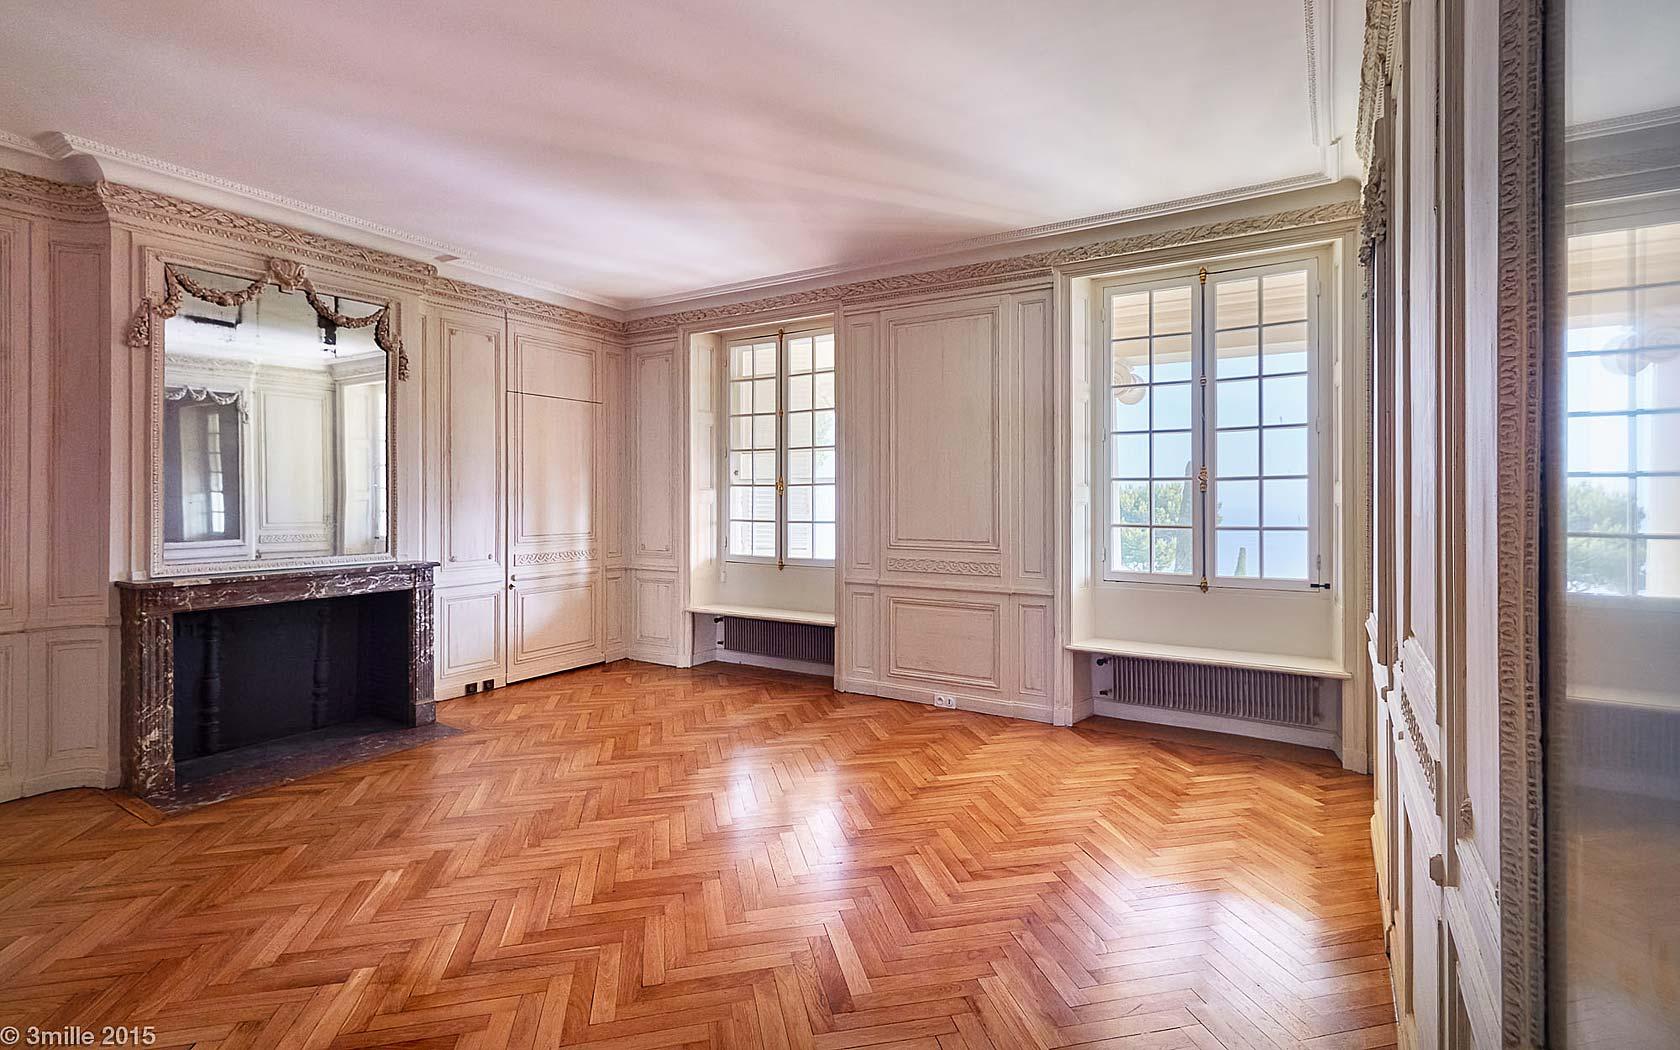 castle la croix des gardes master bedroom herringbone wood floors